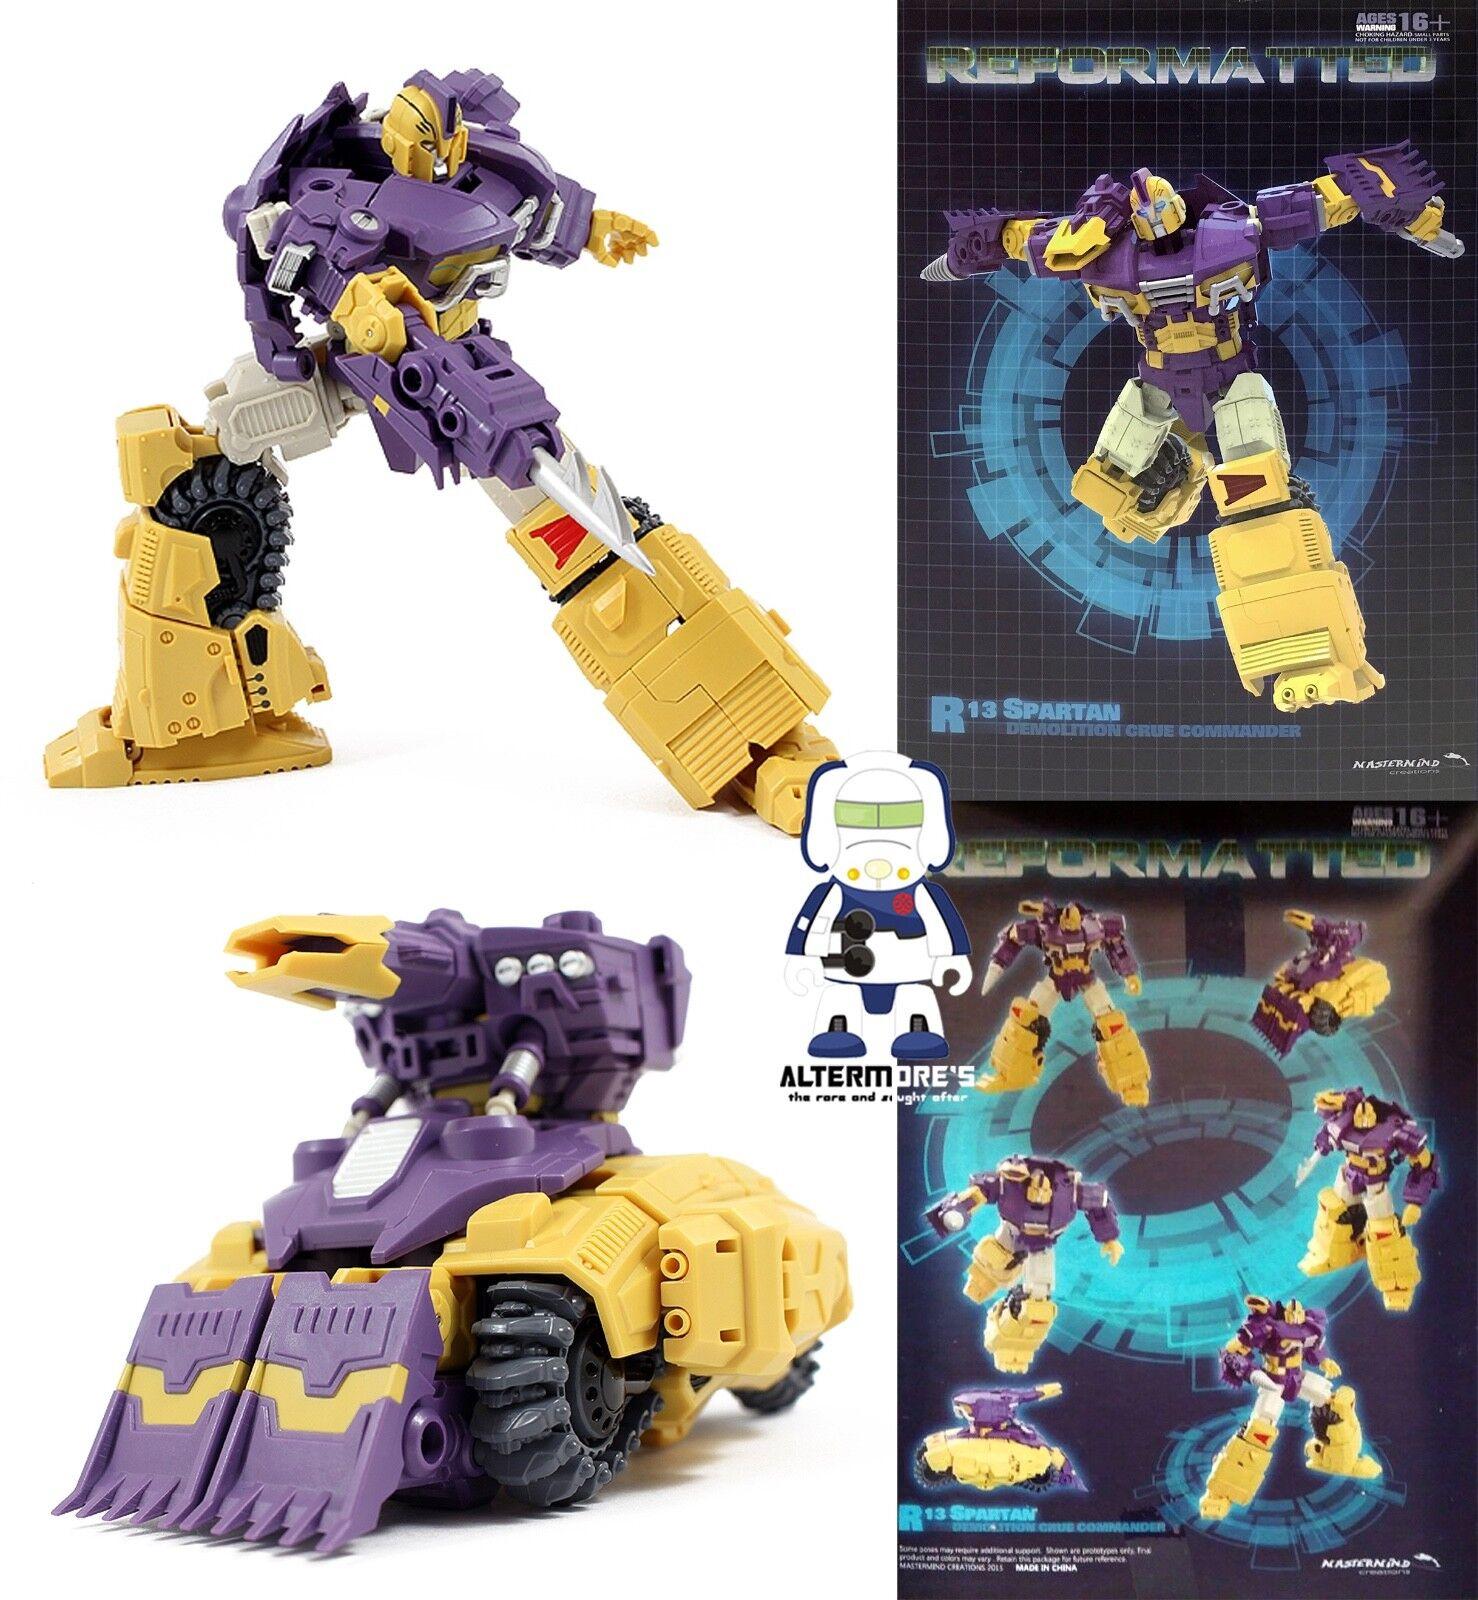 Transformers MMC Reformatted R-13 Spartan aka IDW Impactor MISB